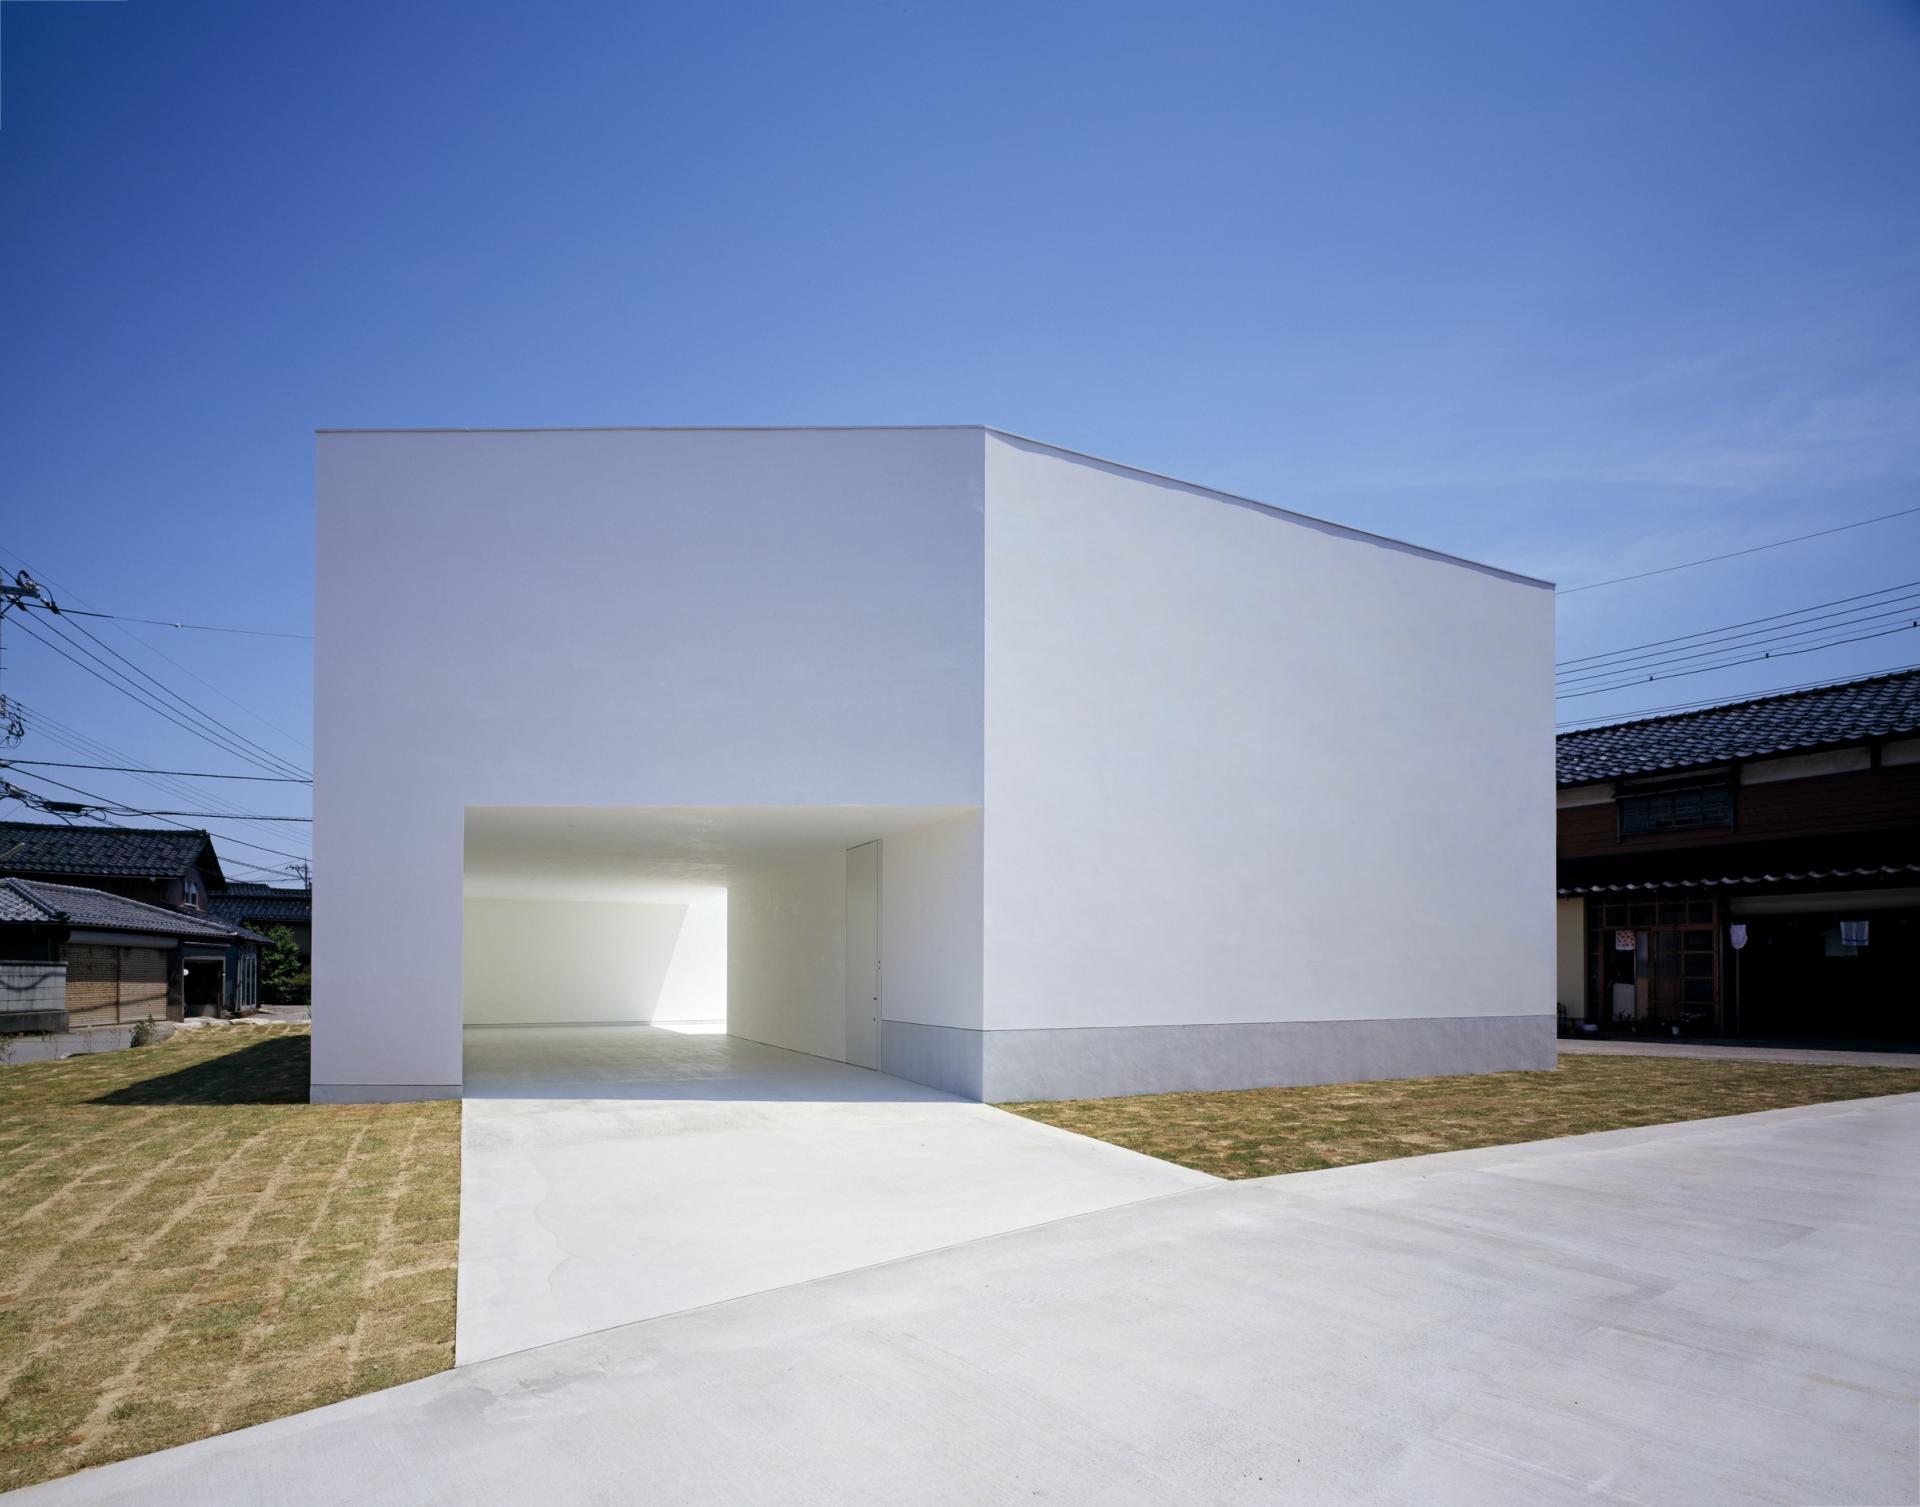 White cave house by takuro yamamoto architects - Arquitectura minimalista ...